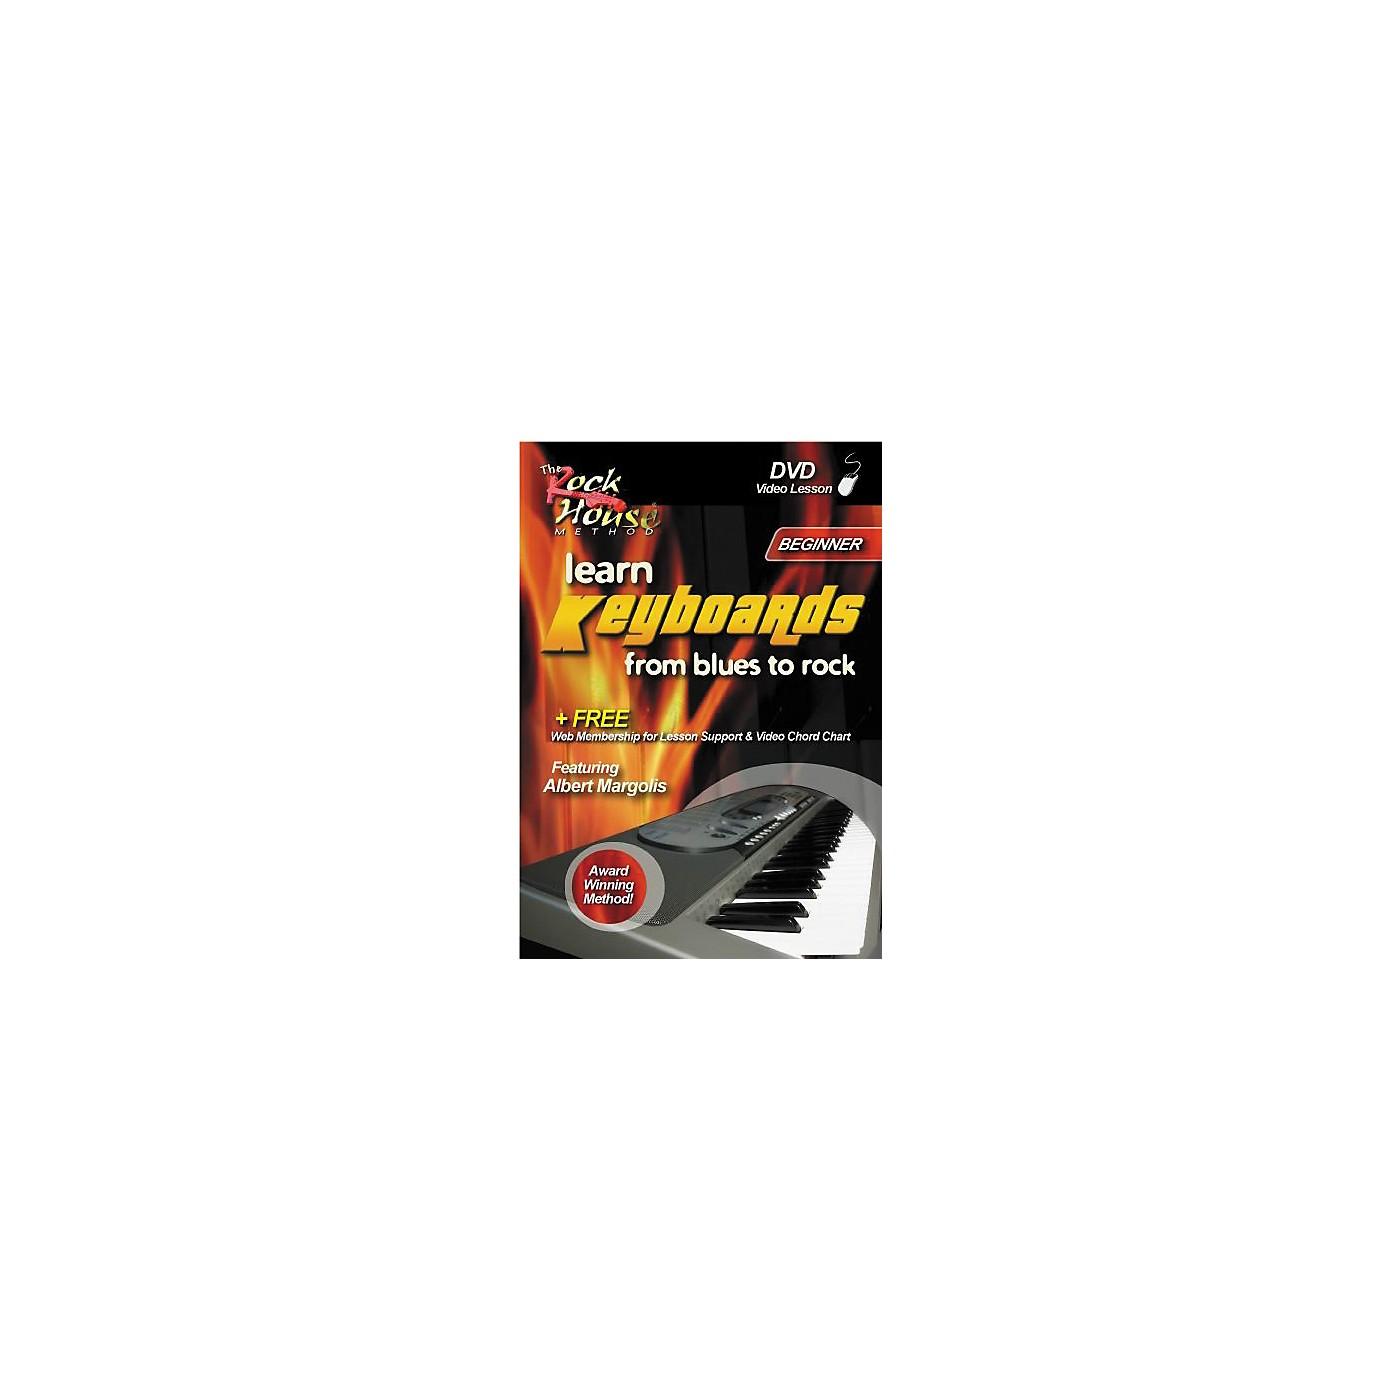 Hal Leonard Learn Keyboards from Blues to Rock - Beginner (DVD) thumbnail